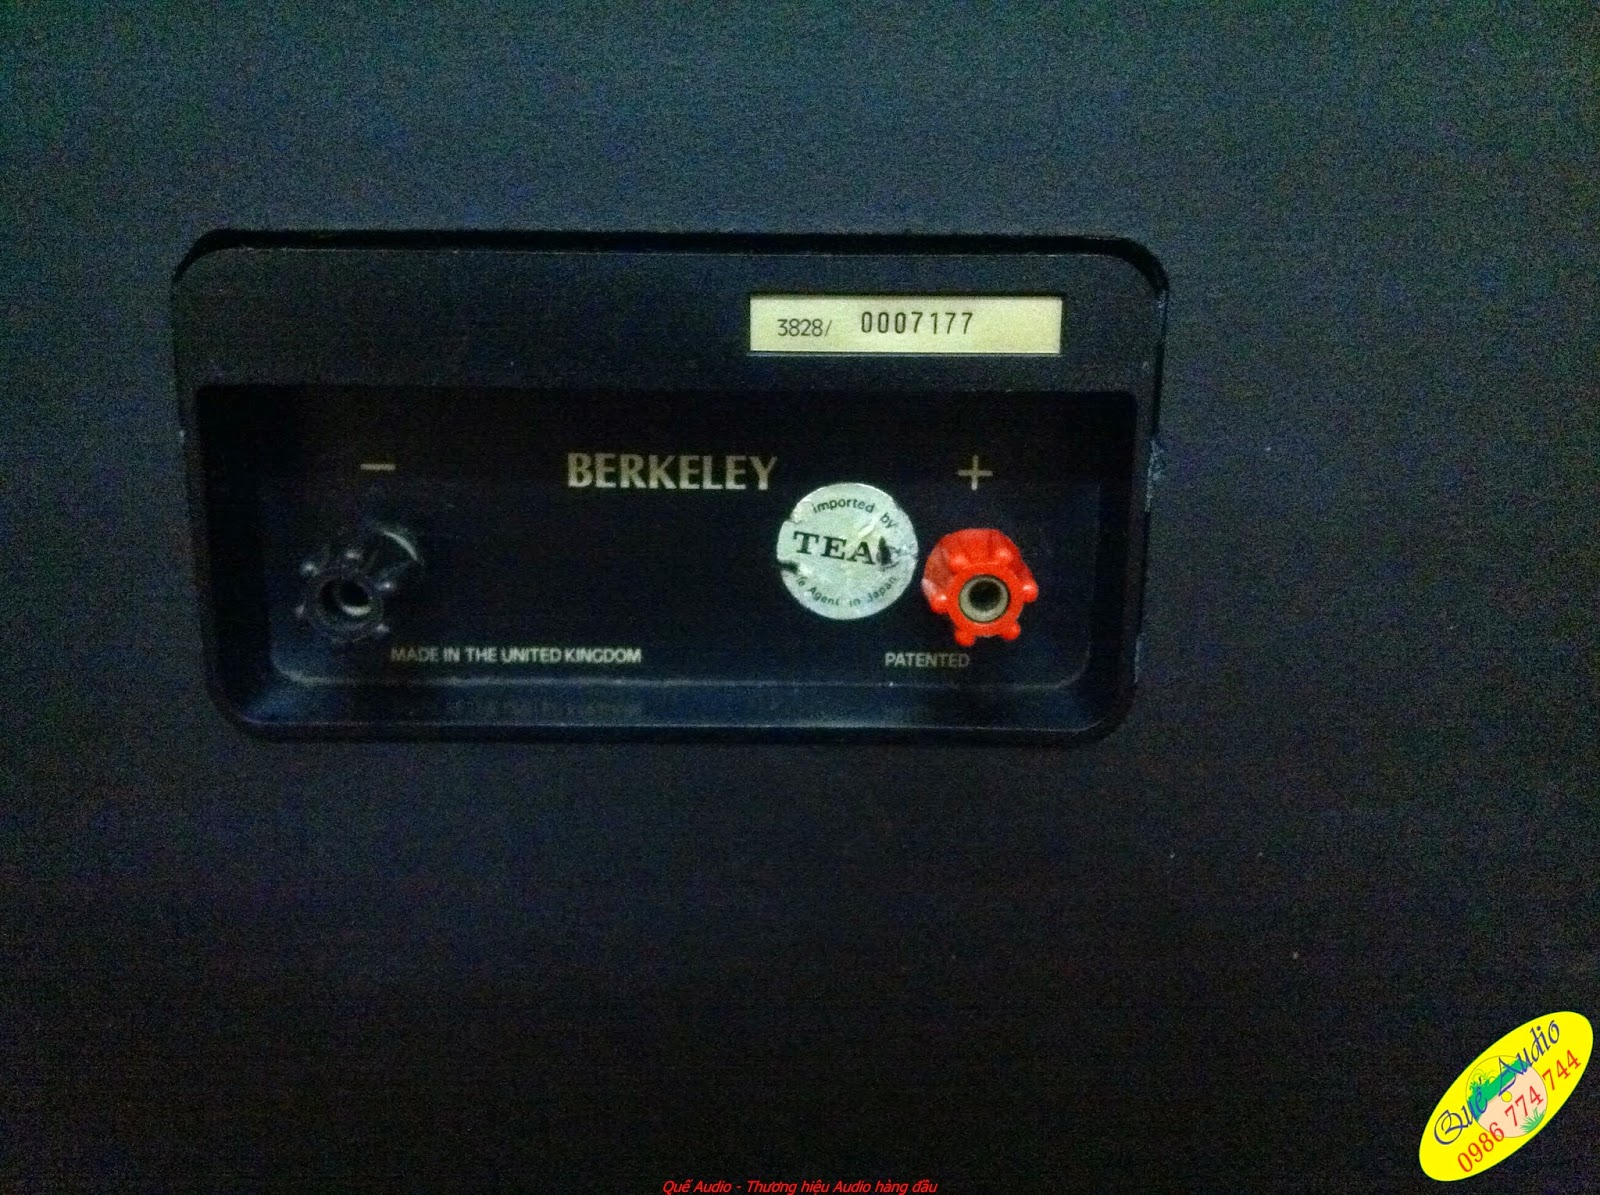 Cận cảnh cầu loa Tannoy Berkeley